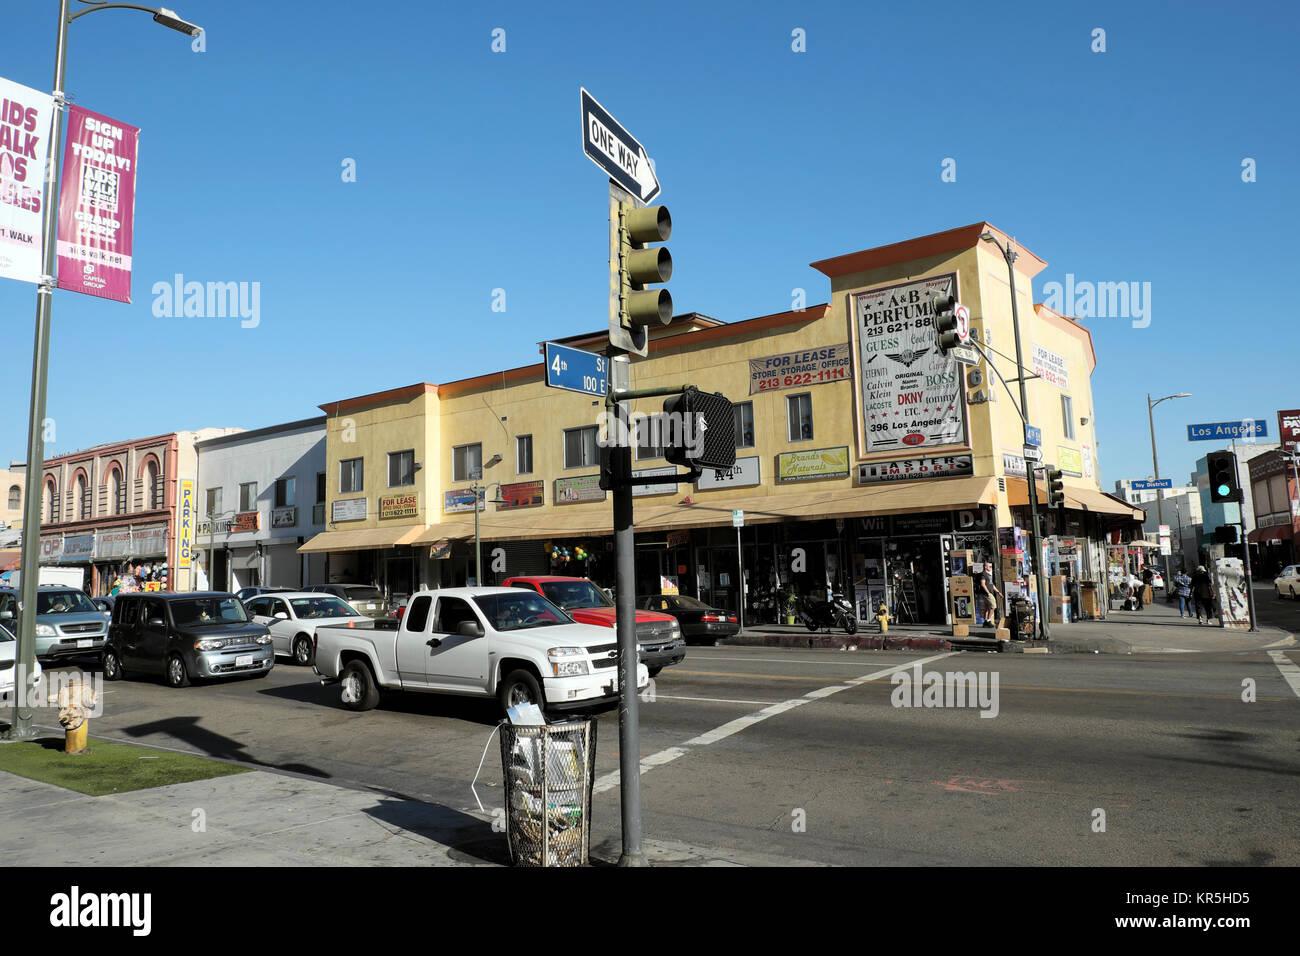 Hotels Near Th Street Los Angeles